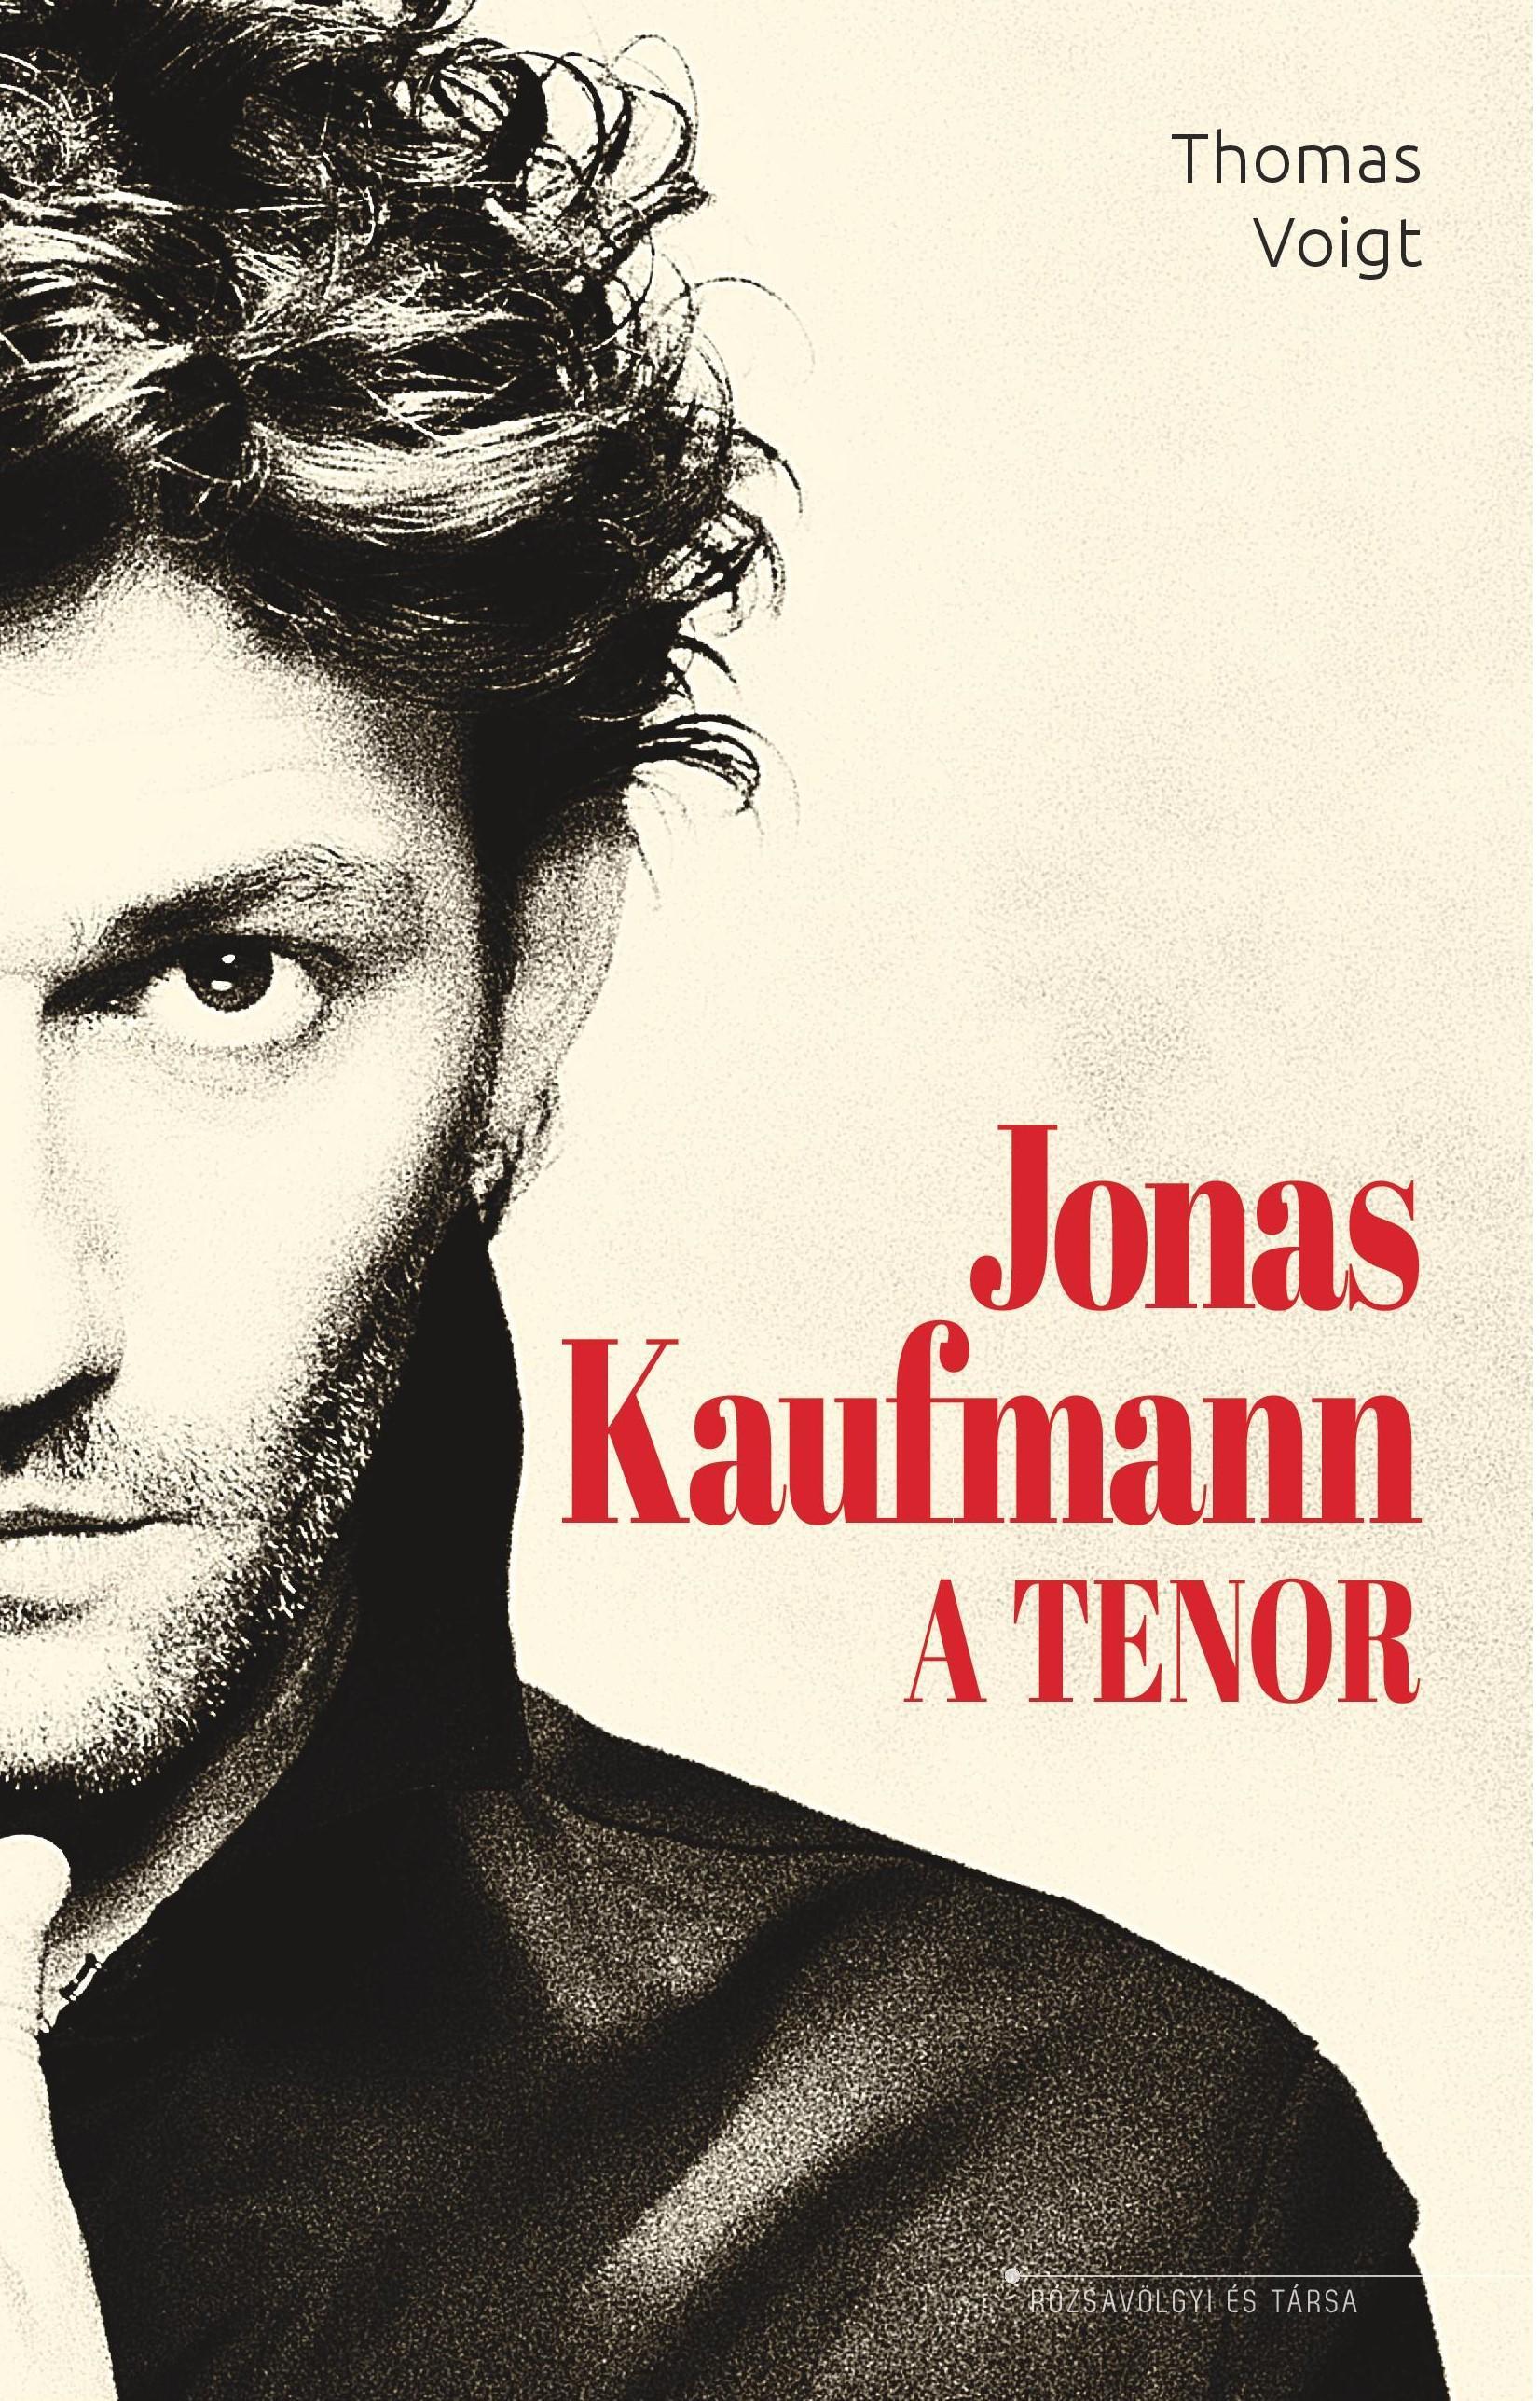 VOIGHT, THOMAS - JONAS KAUFMANN - A TENOR